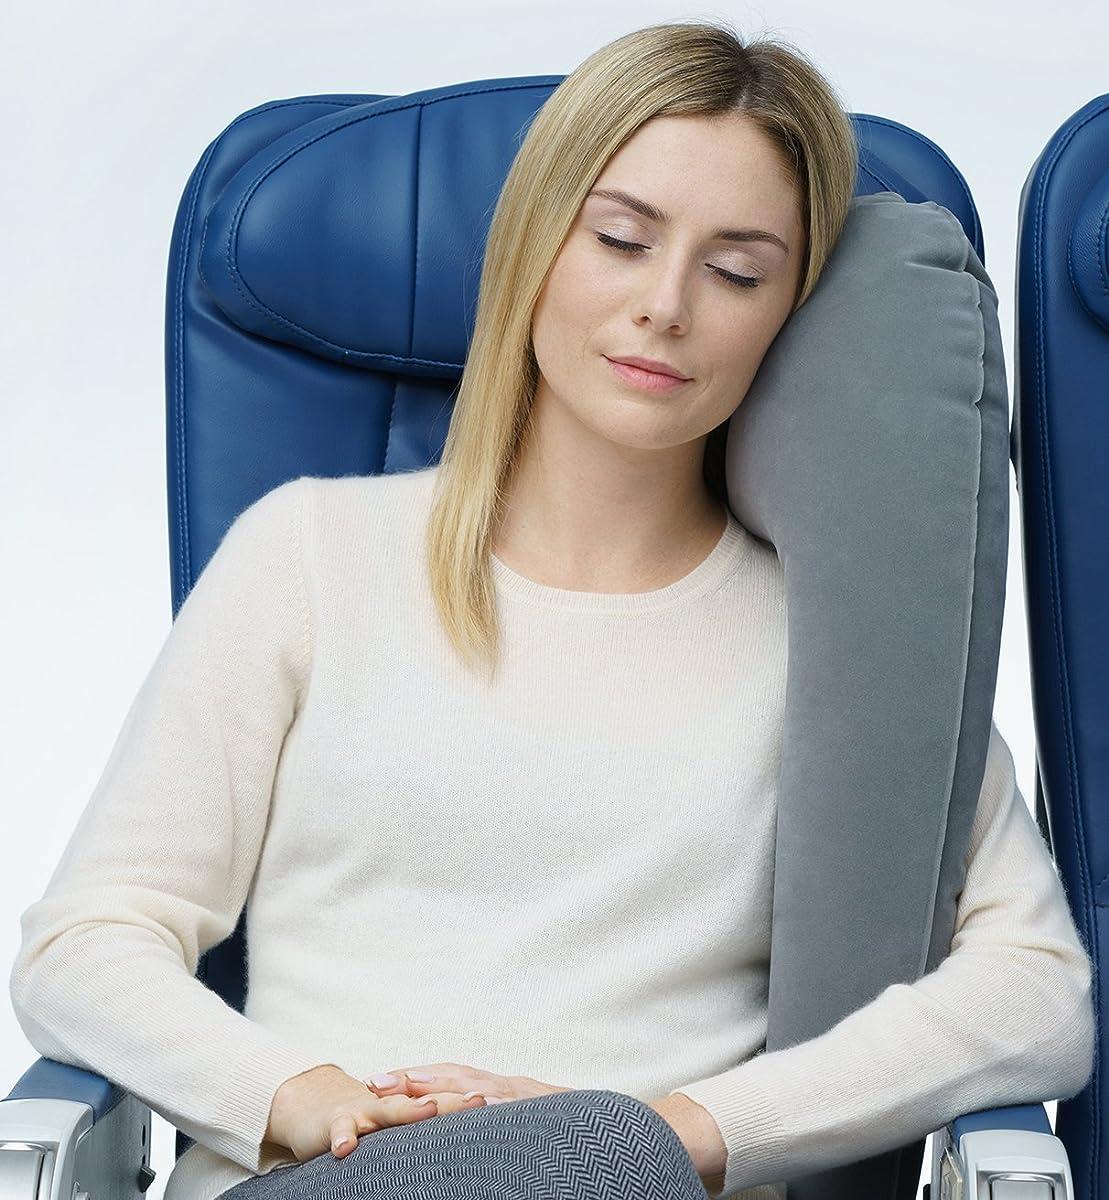 Travelrest Ultimate Travel Pillow Neck Pillow